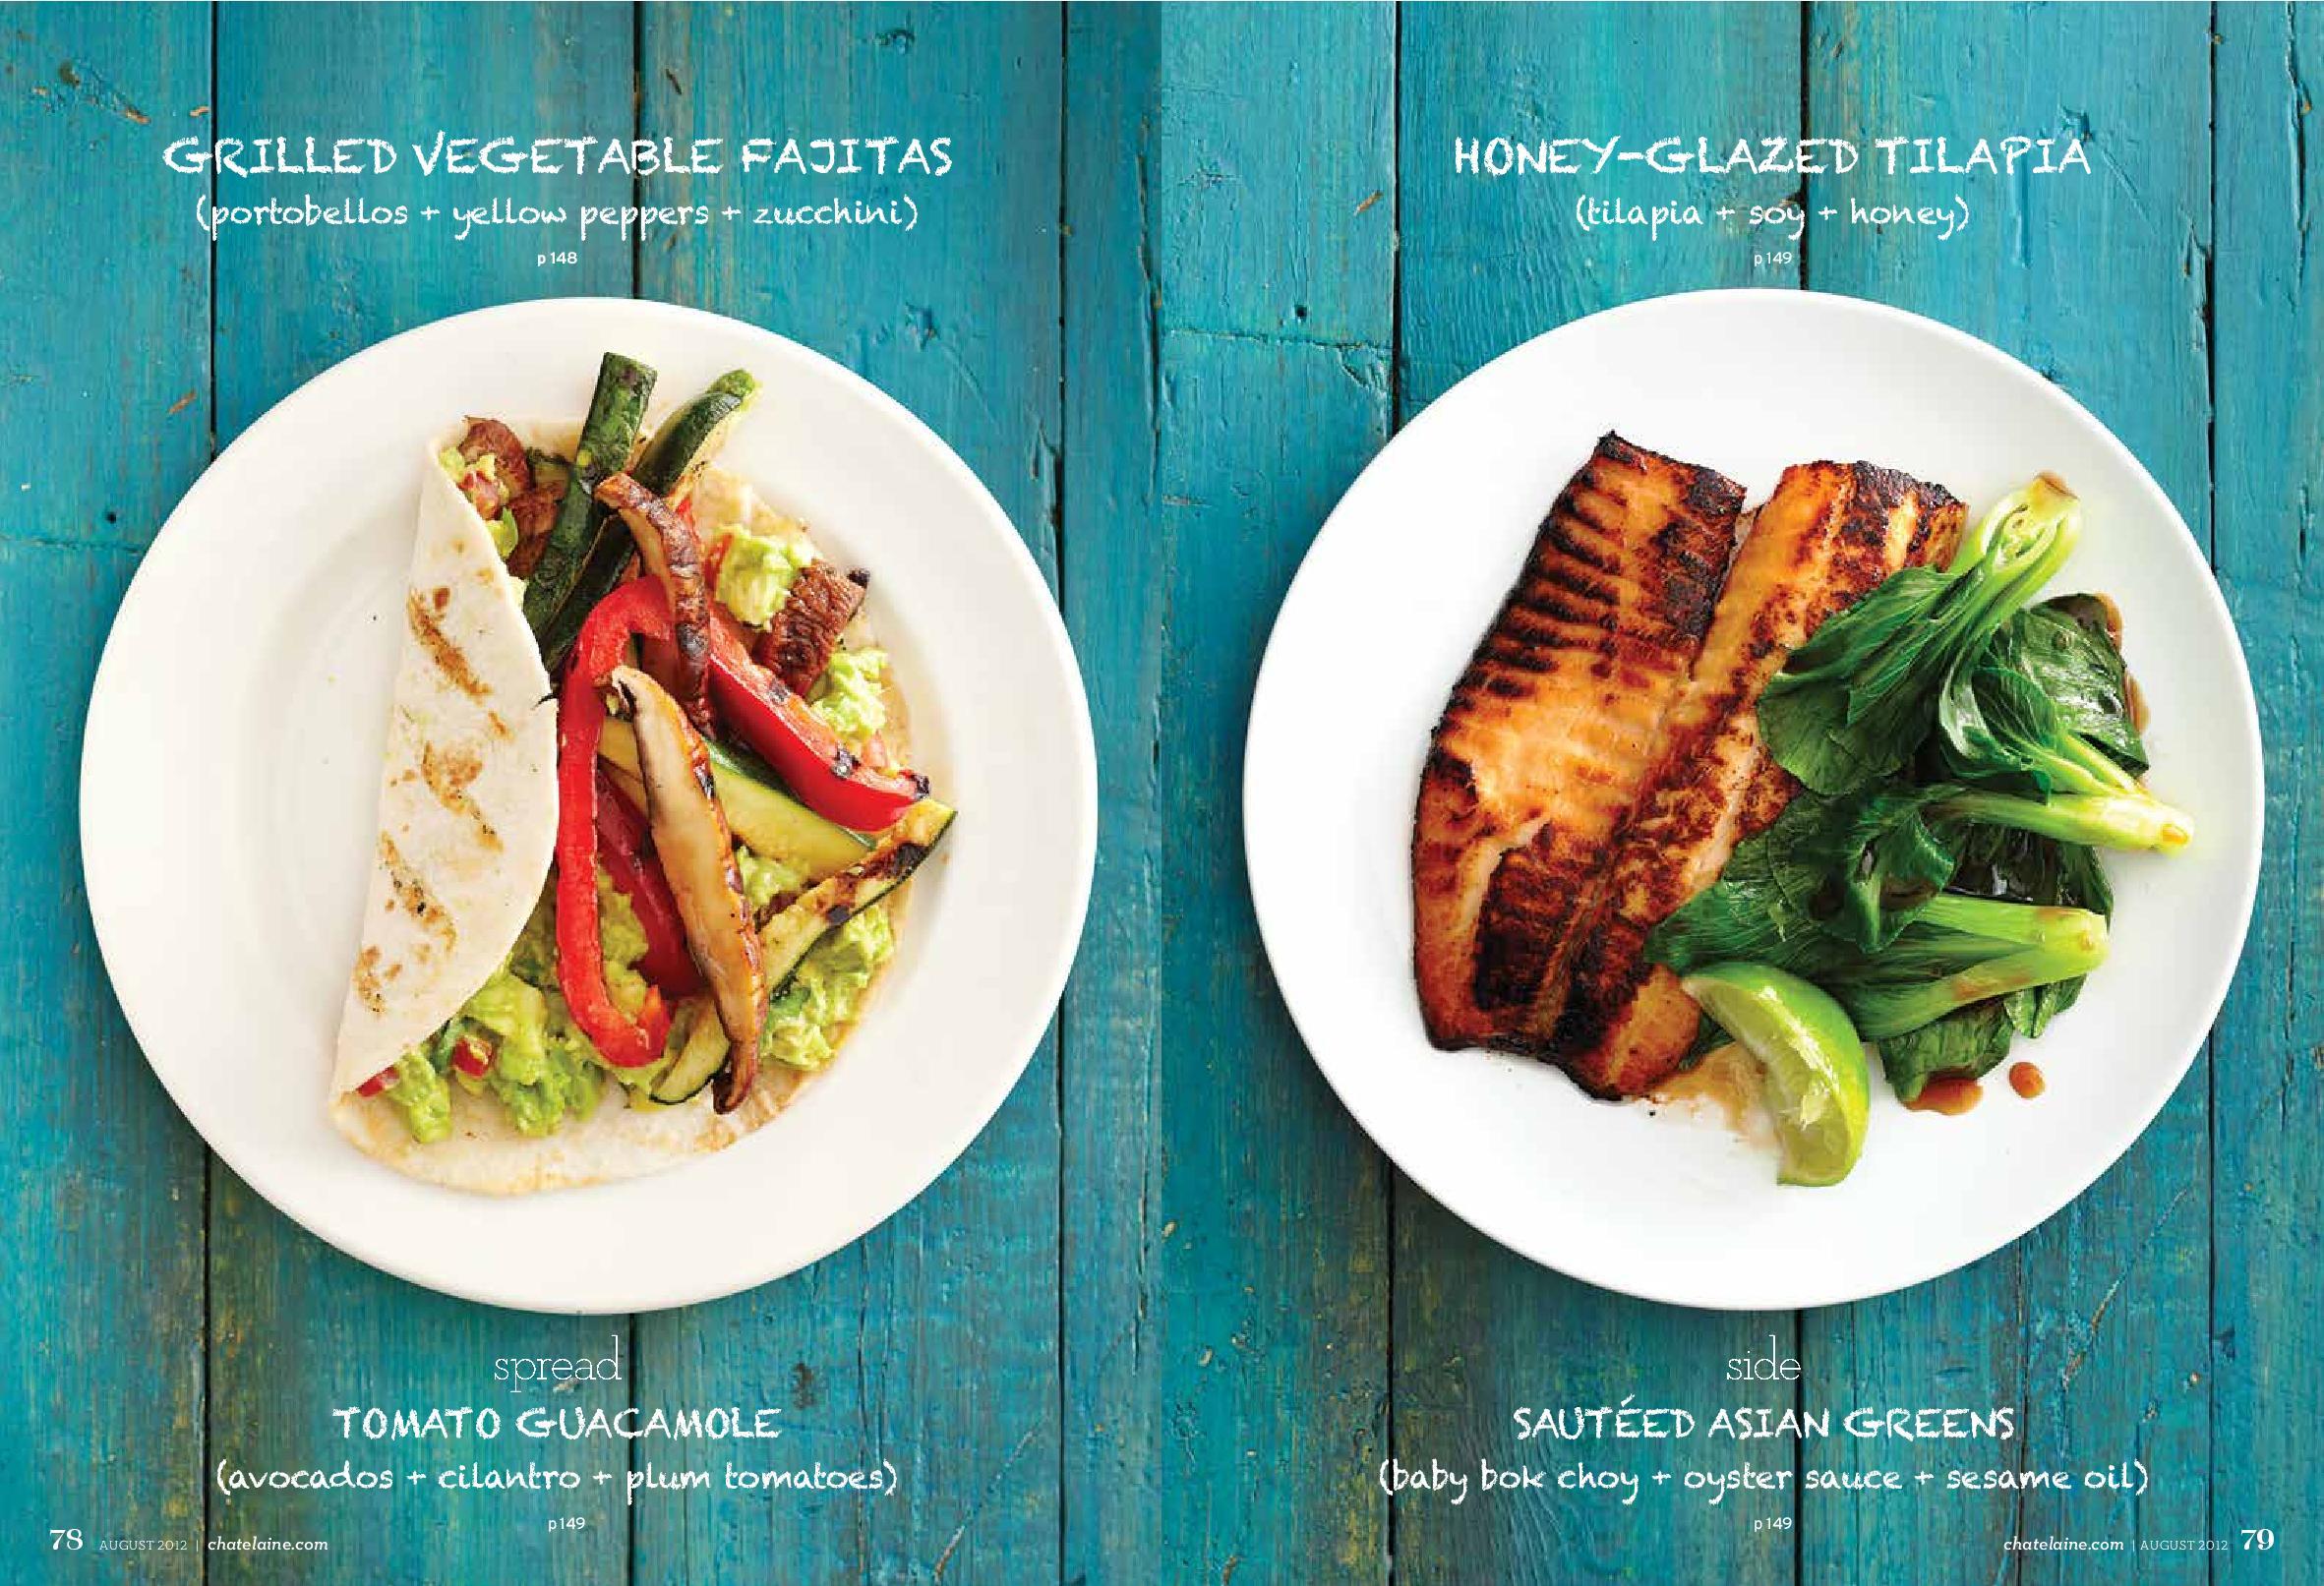 healthy dinner 123 aug 2012-page-002.jpg